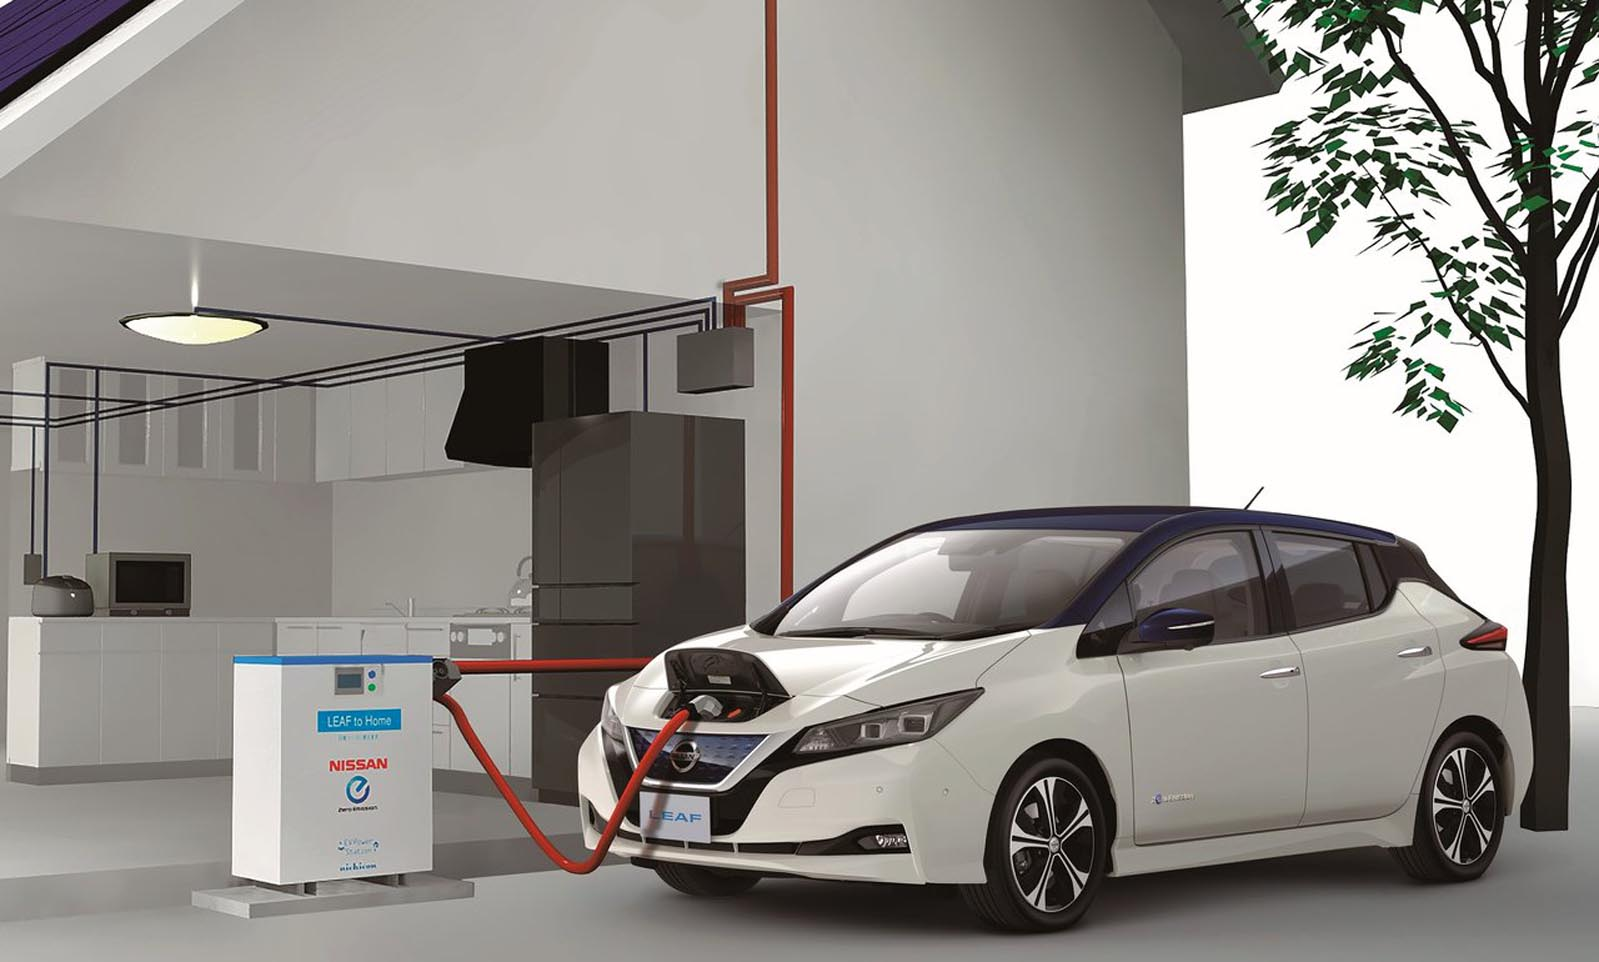 Photo of BHP Billiton: Τι λέει η μεγαλύτερη εταιρία ορυχείων για τα ηλεκτρικά αυτοκίνητα;